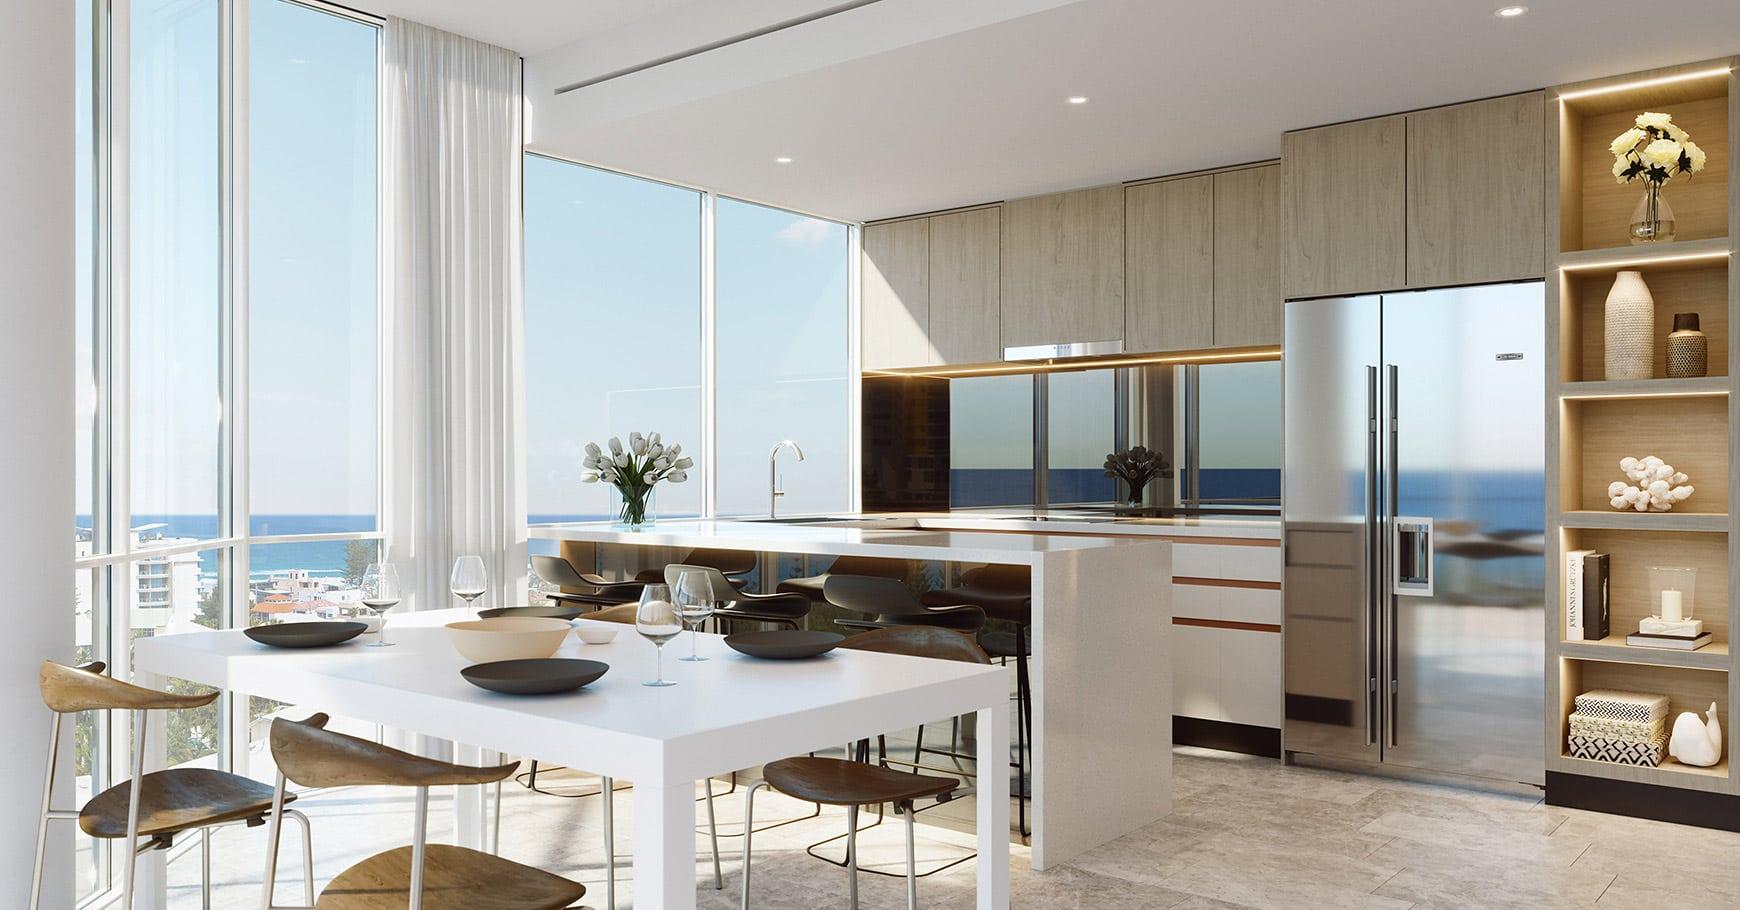 Real Estate   Gold Coast   Chevron Realty   Naia Mermaidbeach 0001 E11 3bb Livingkitchen 05